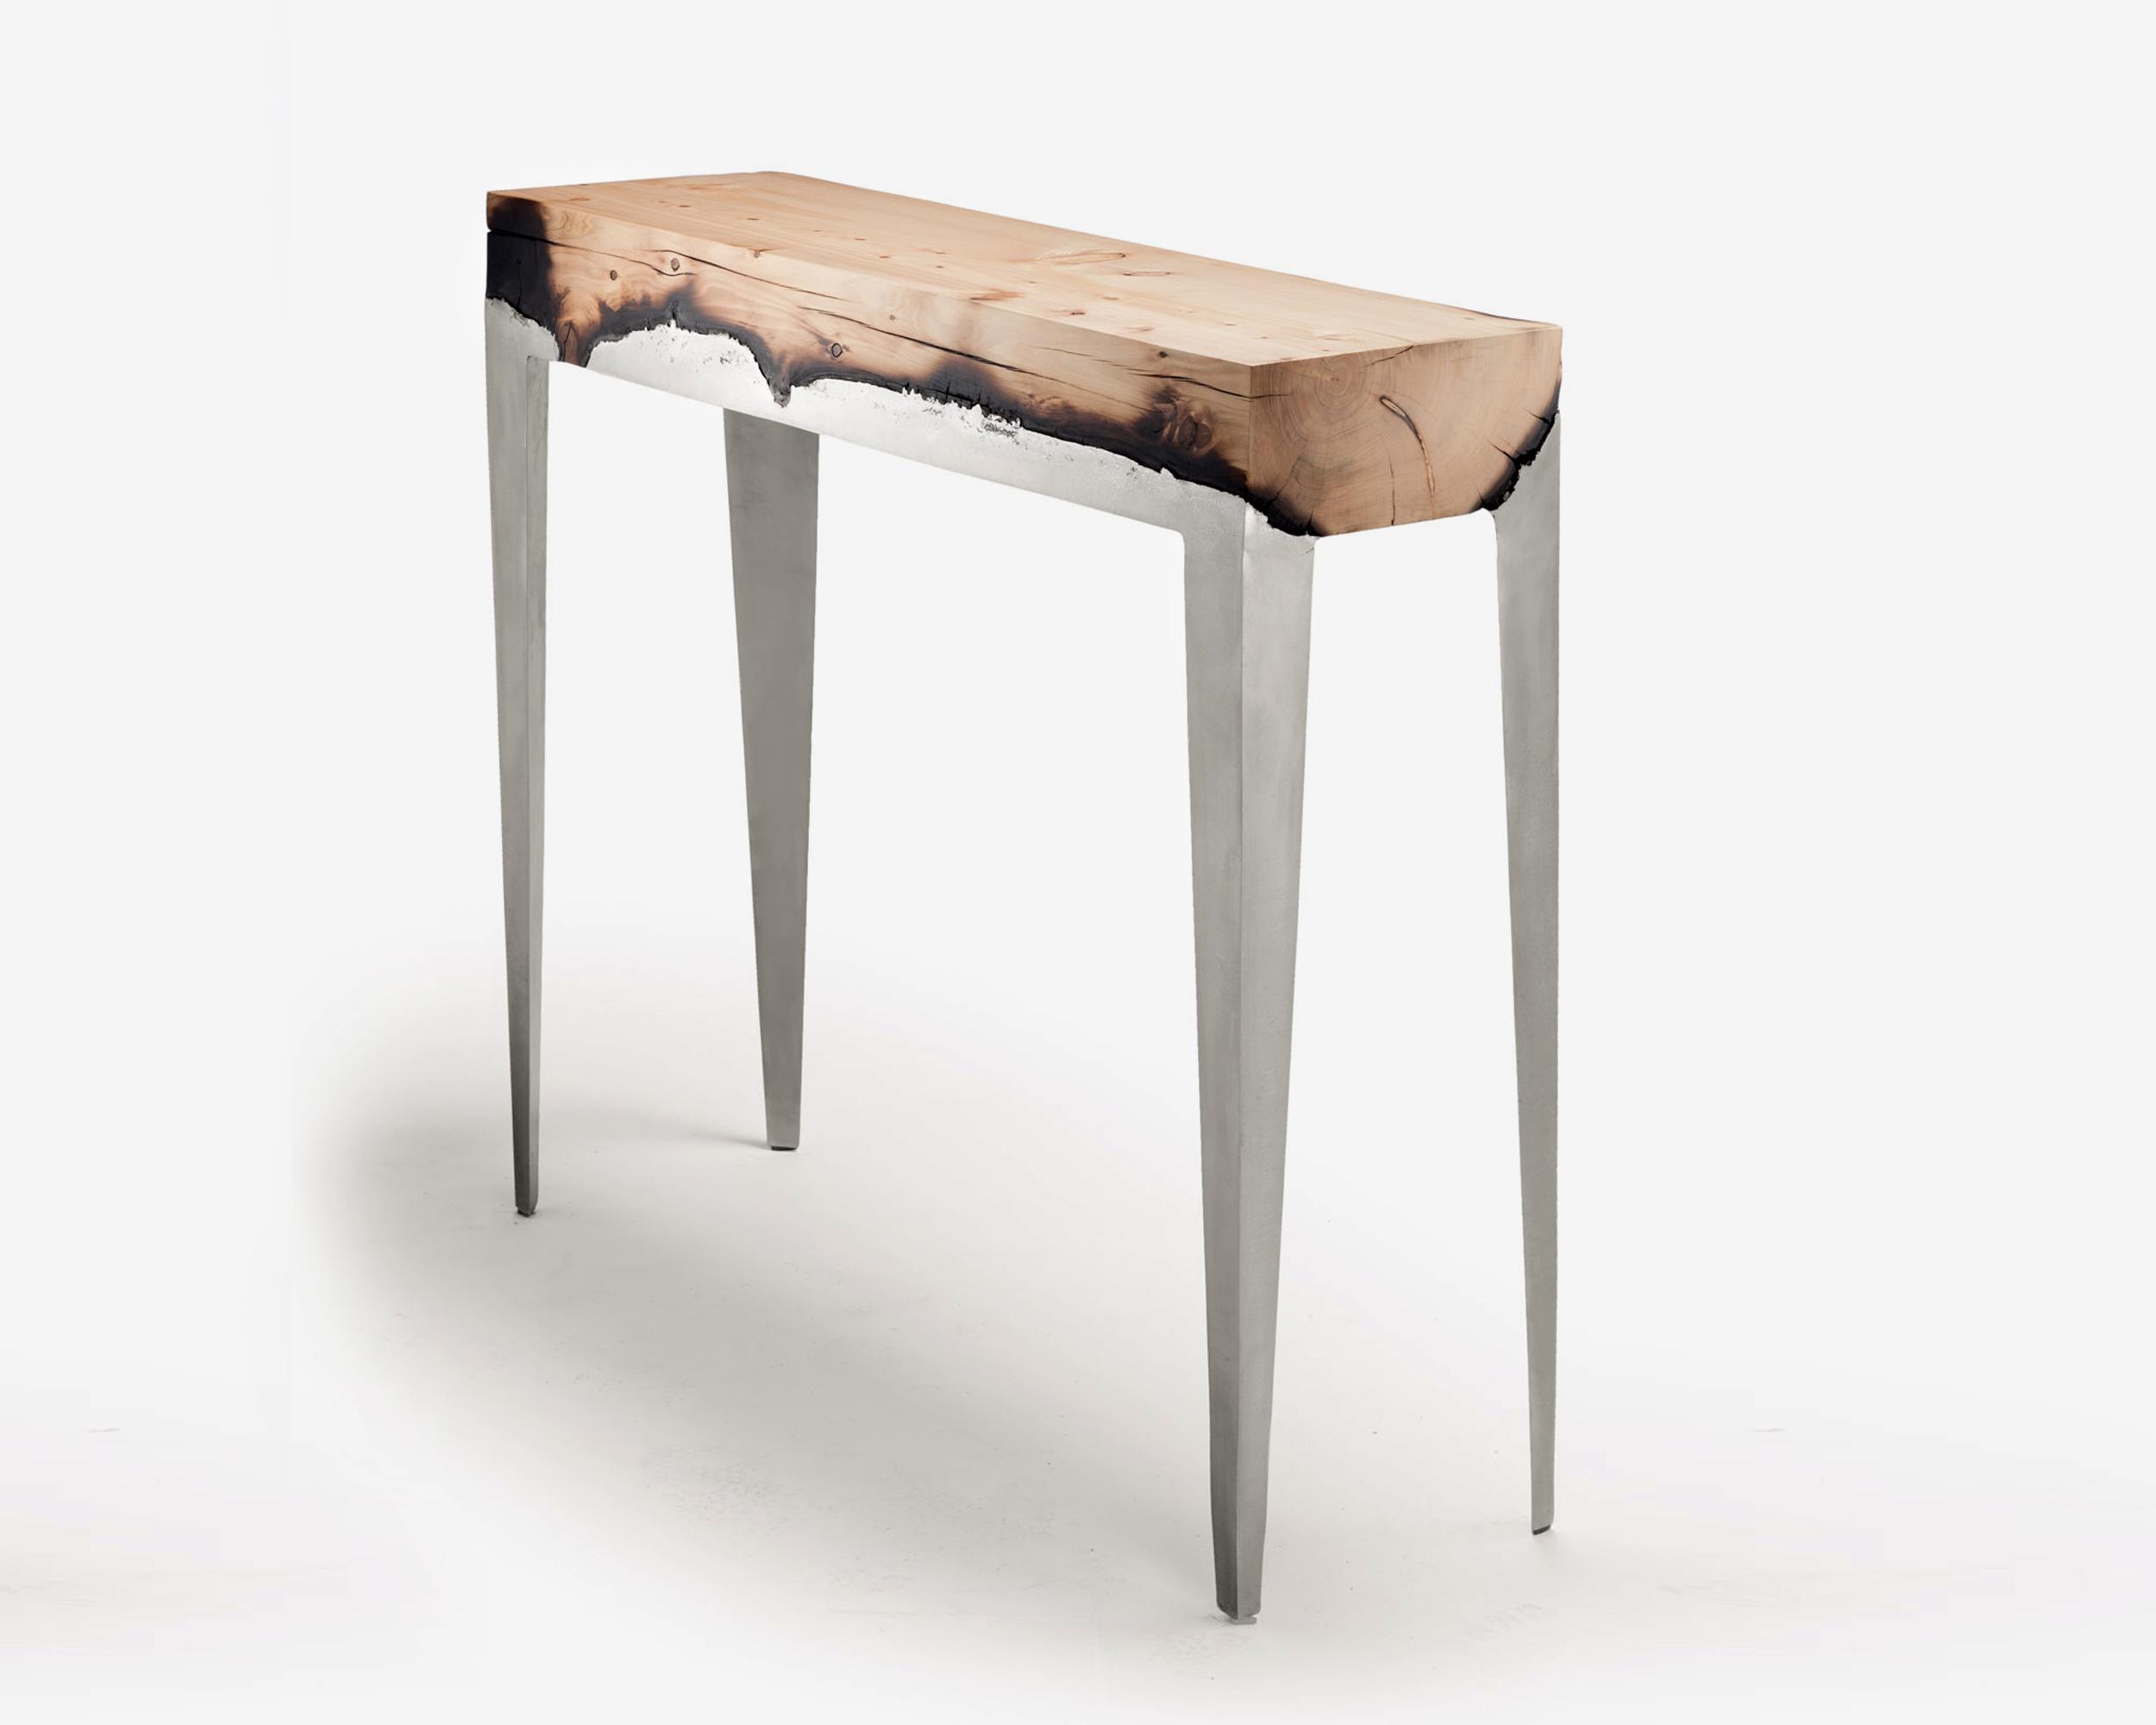 WoodCasting052-Hilla-Shamia-SavannahBay